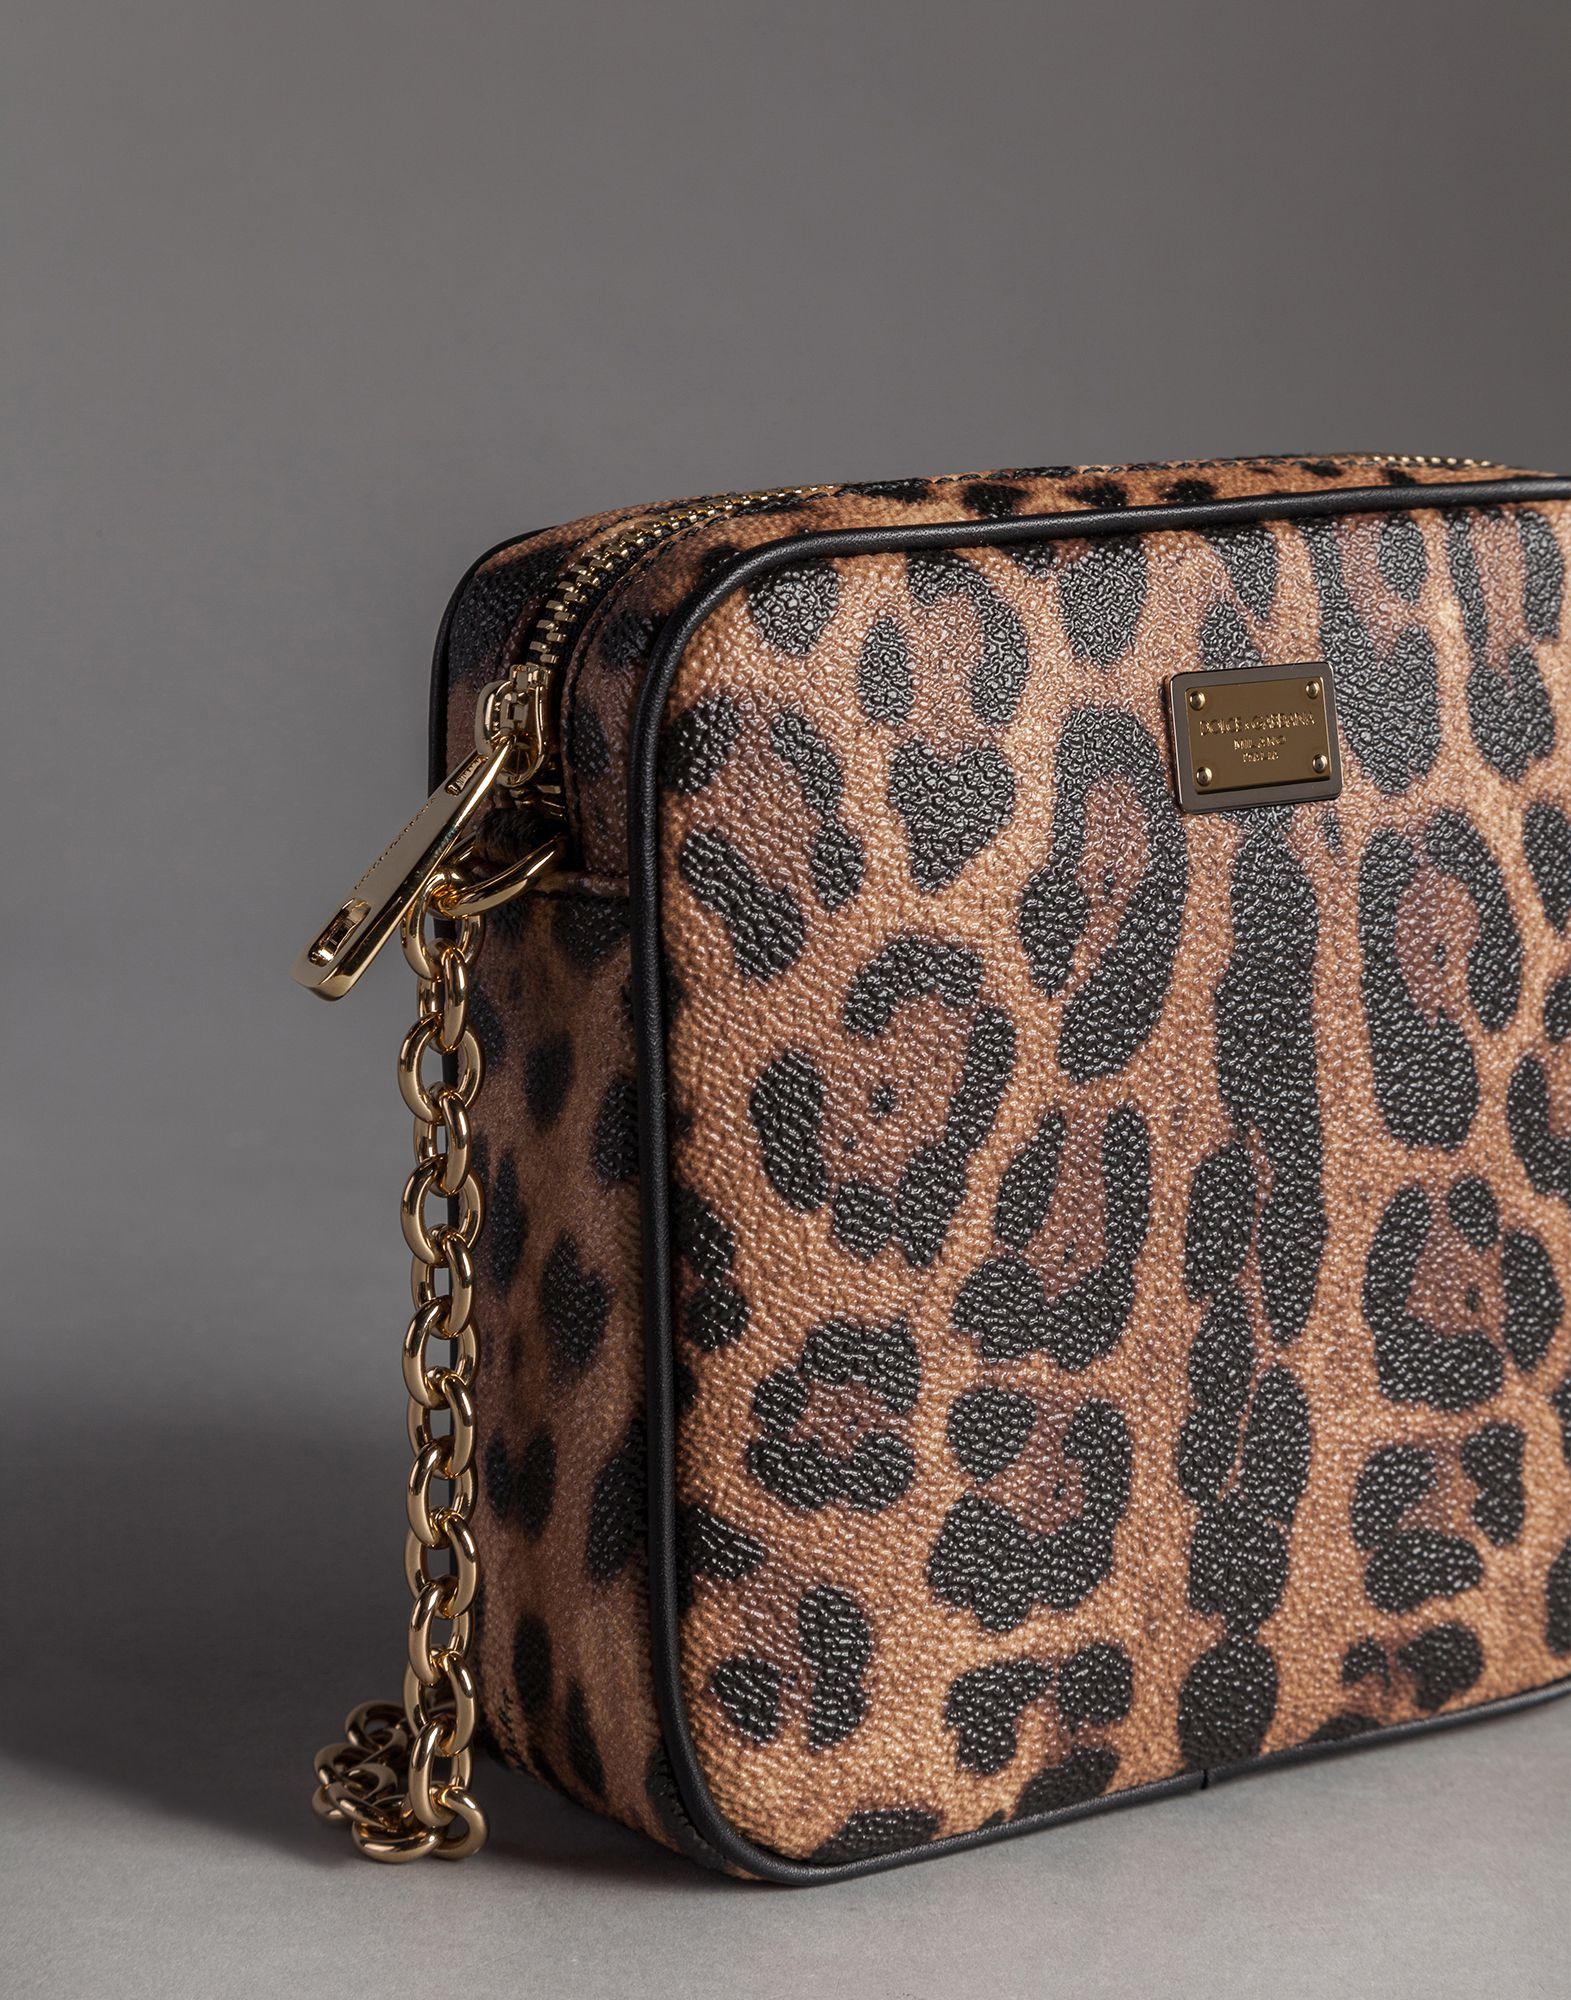 bbe3ee4be5 Authentic Dolce Gabbana Leopard Shoulder Bag Reebonz United States ...